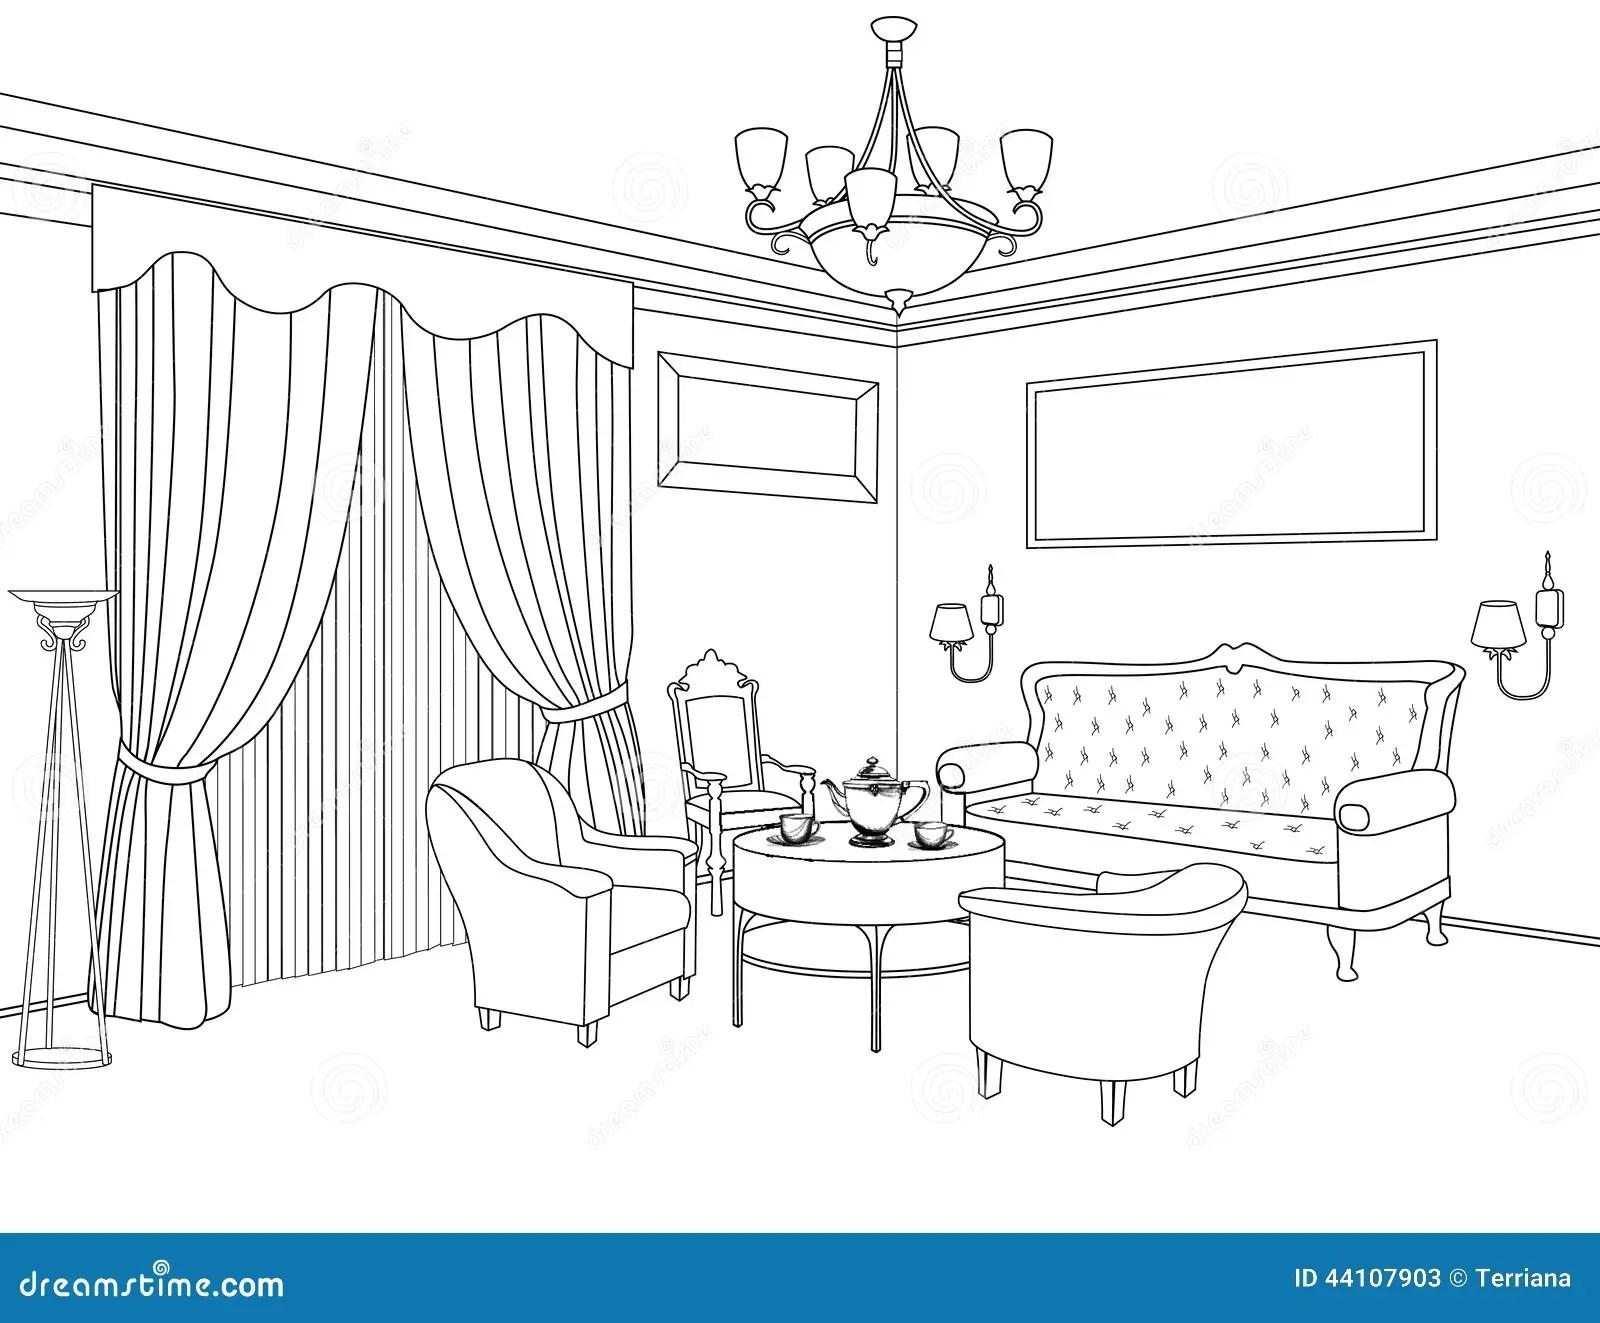 Interior Outline Sketch Furniture Architectural Design